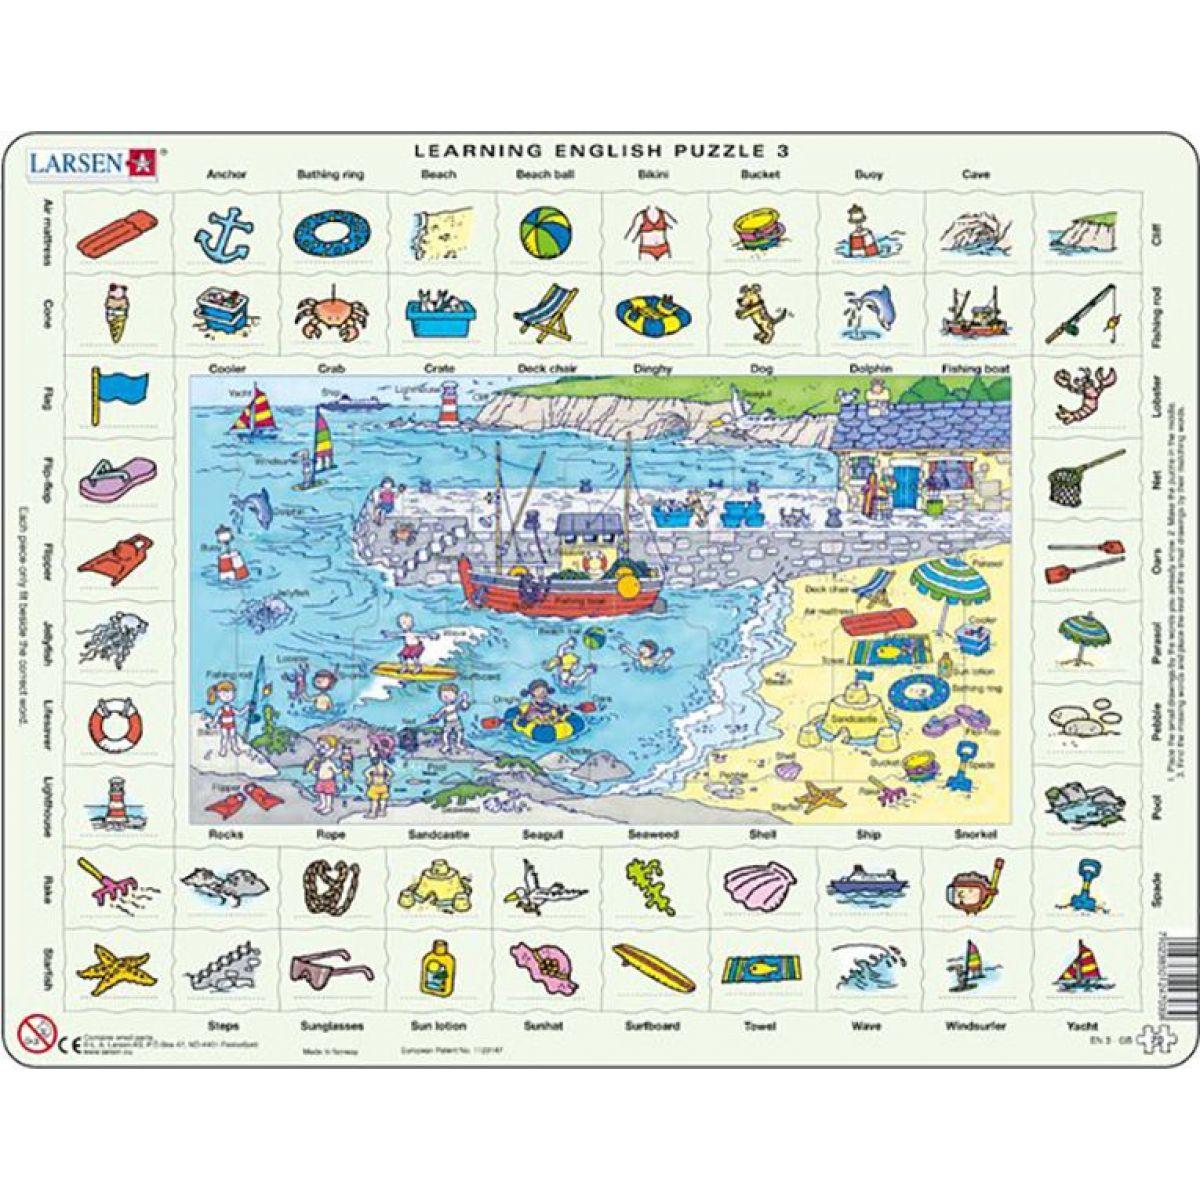 Larsen Puzzle Hodina angličtiny 3